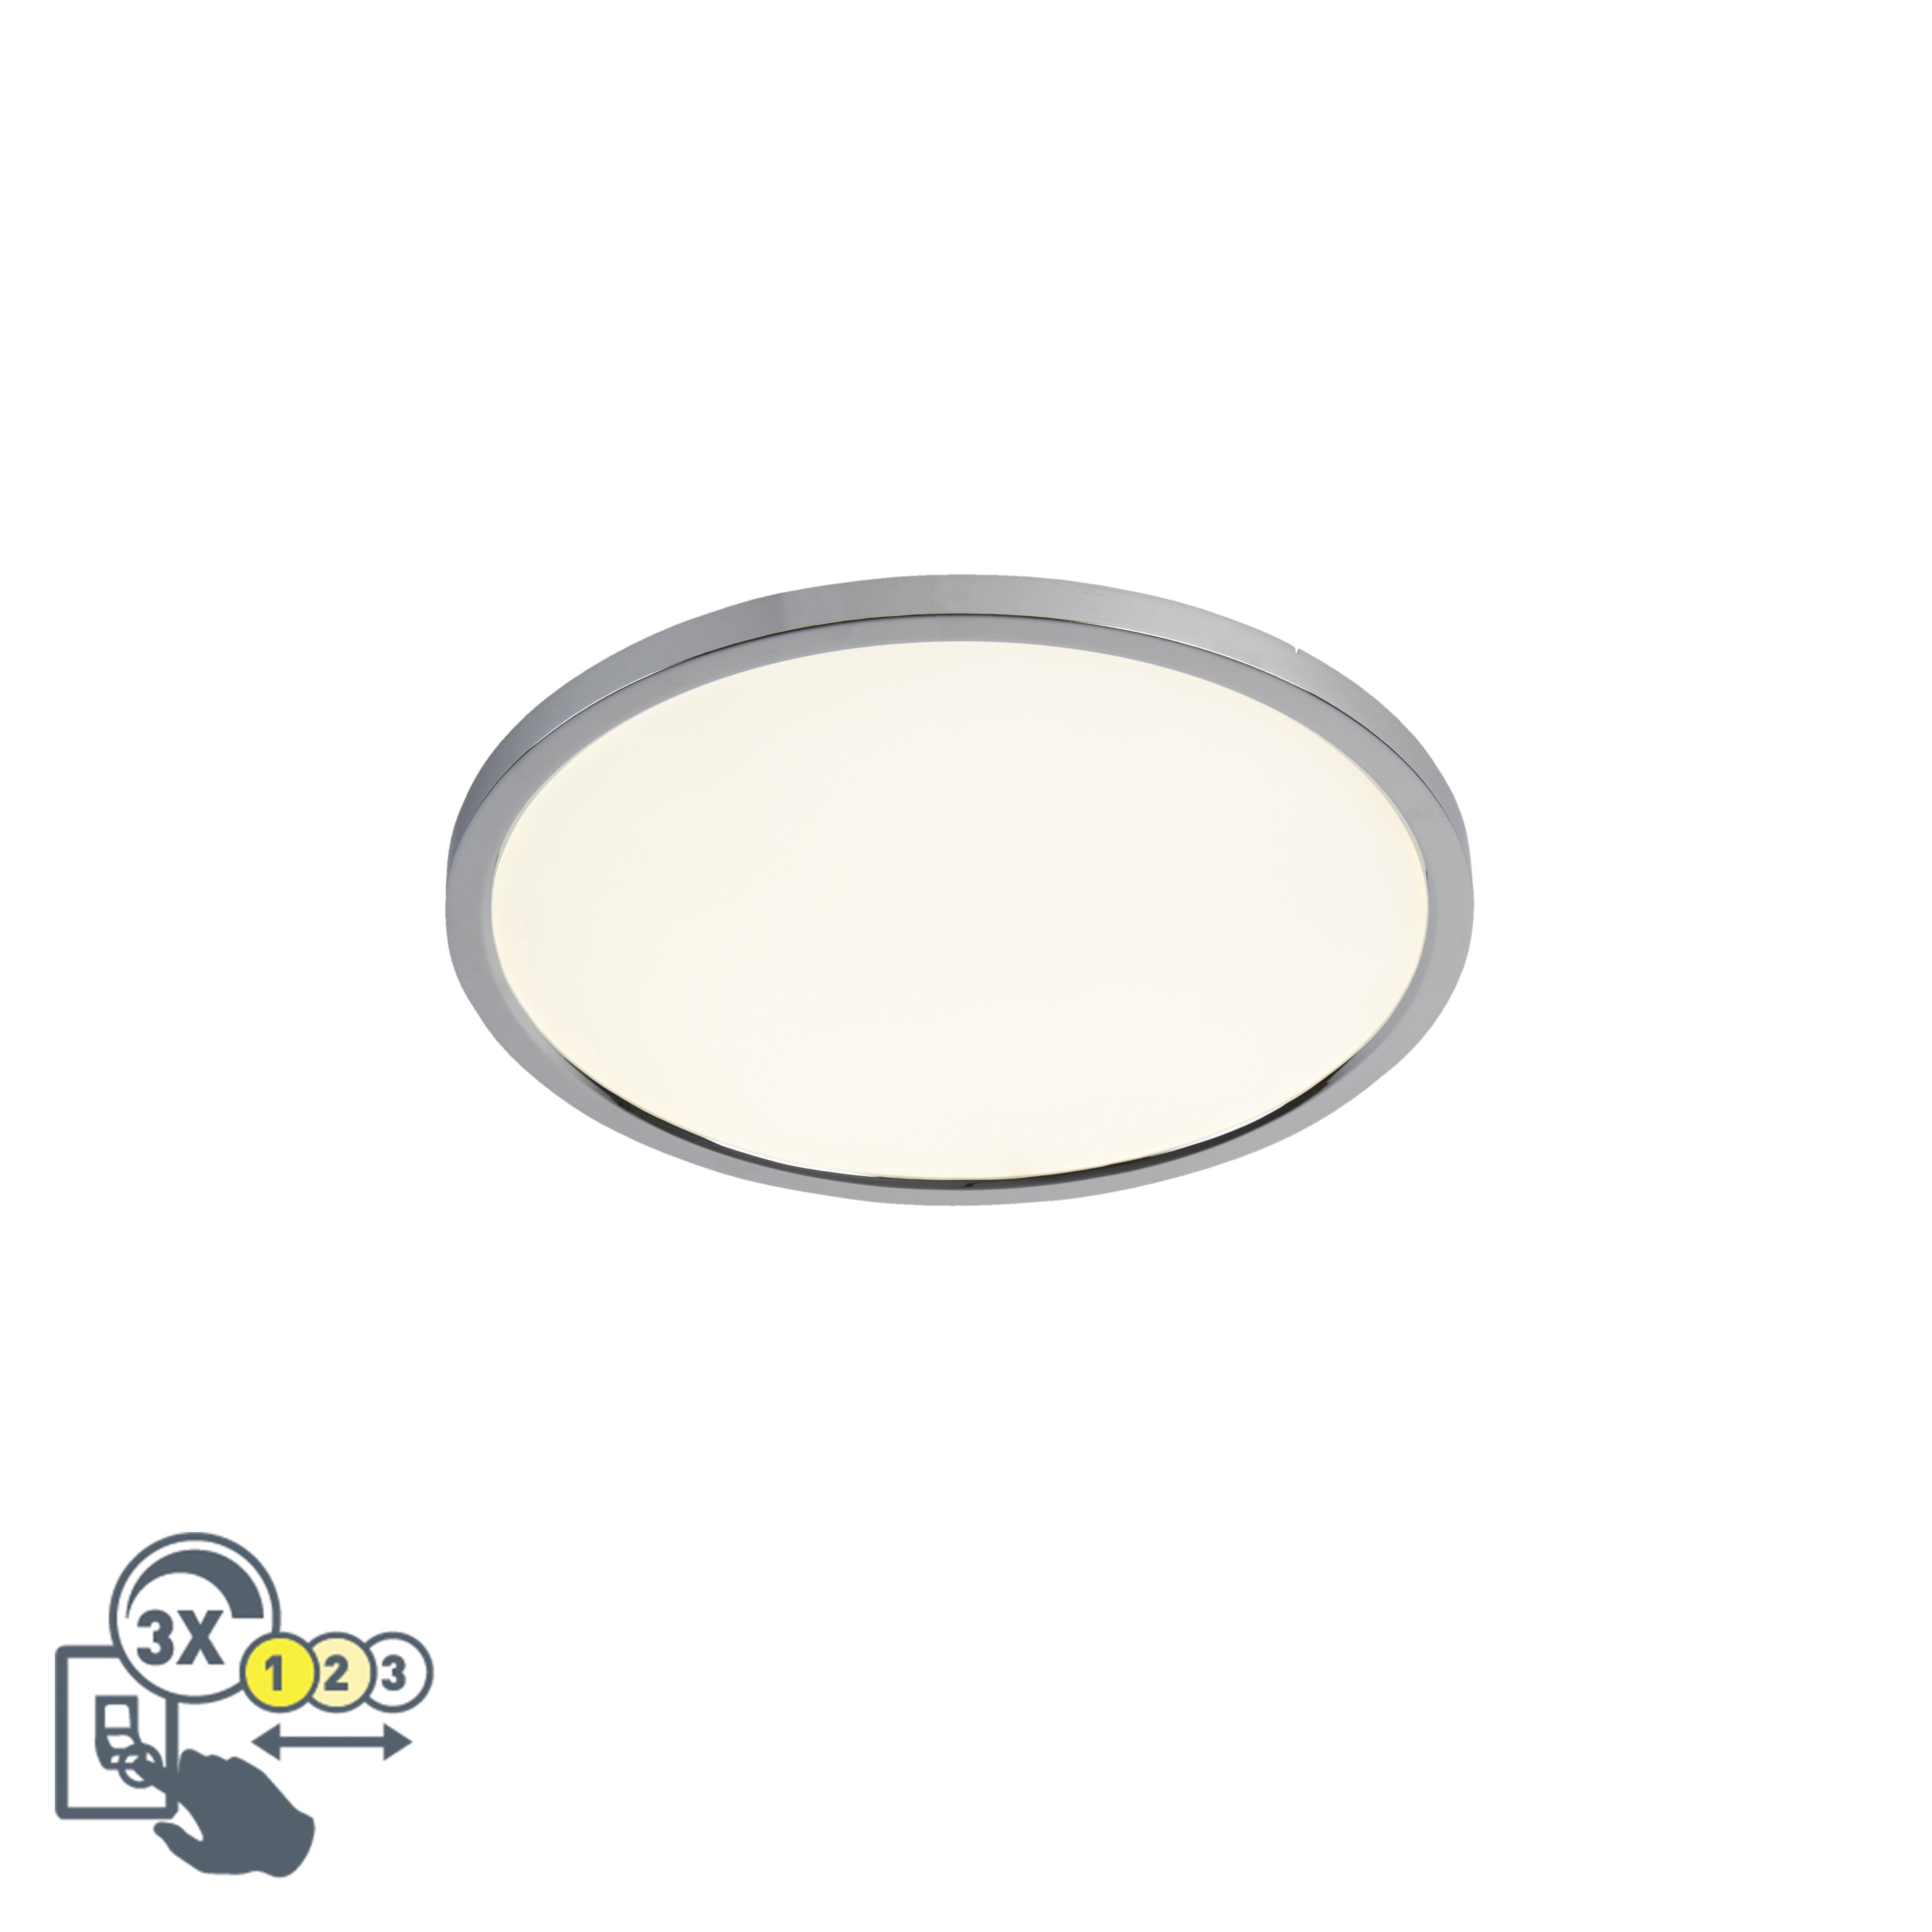 Moderne ronde plafondlamp chroom 45cm incl. LED IP44 - Flat